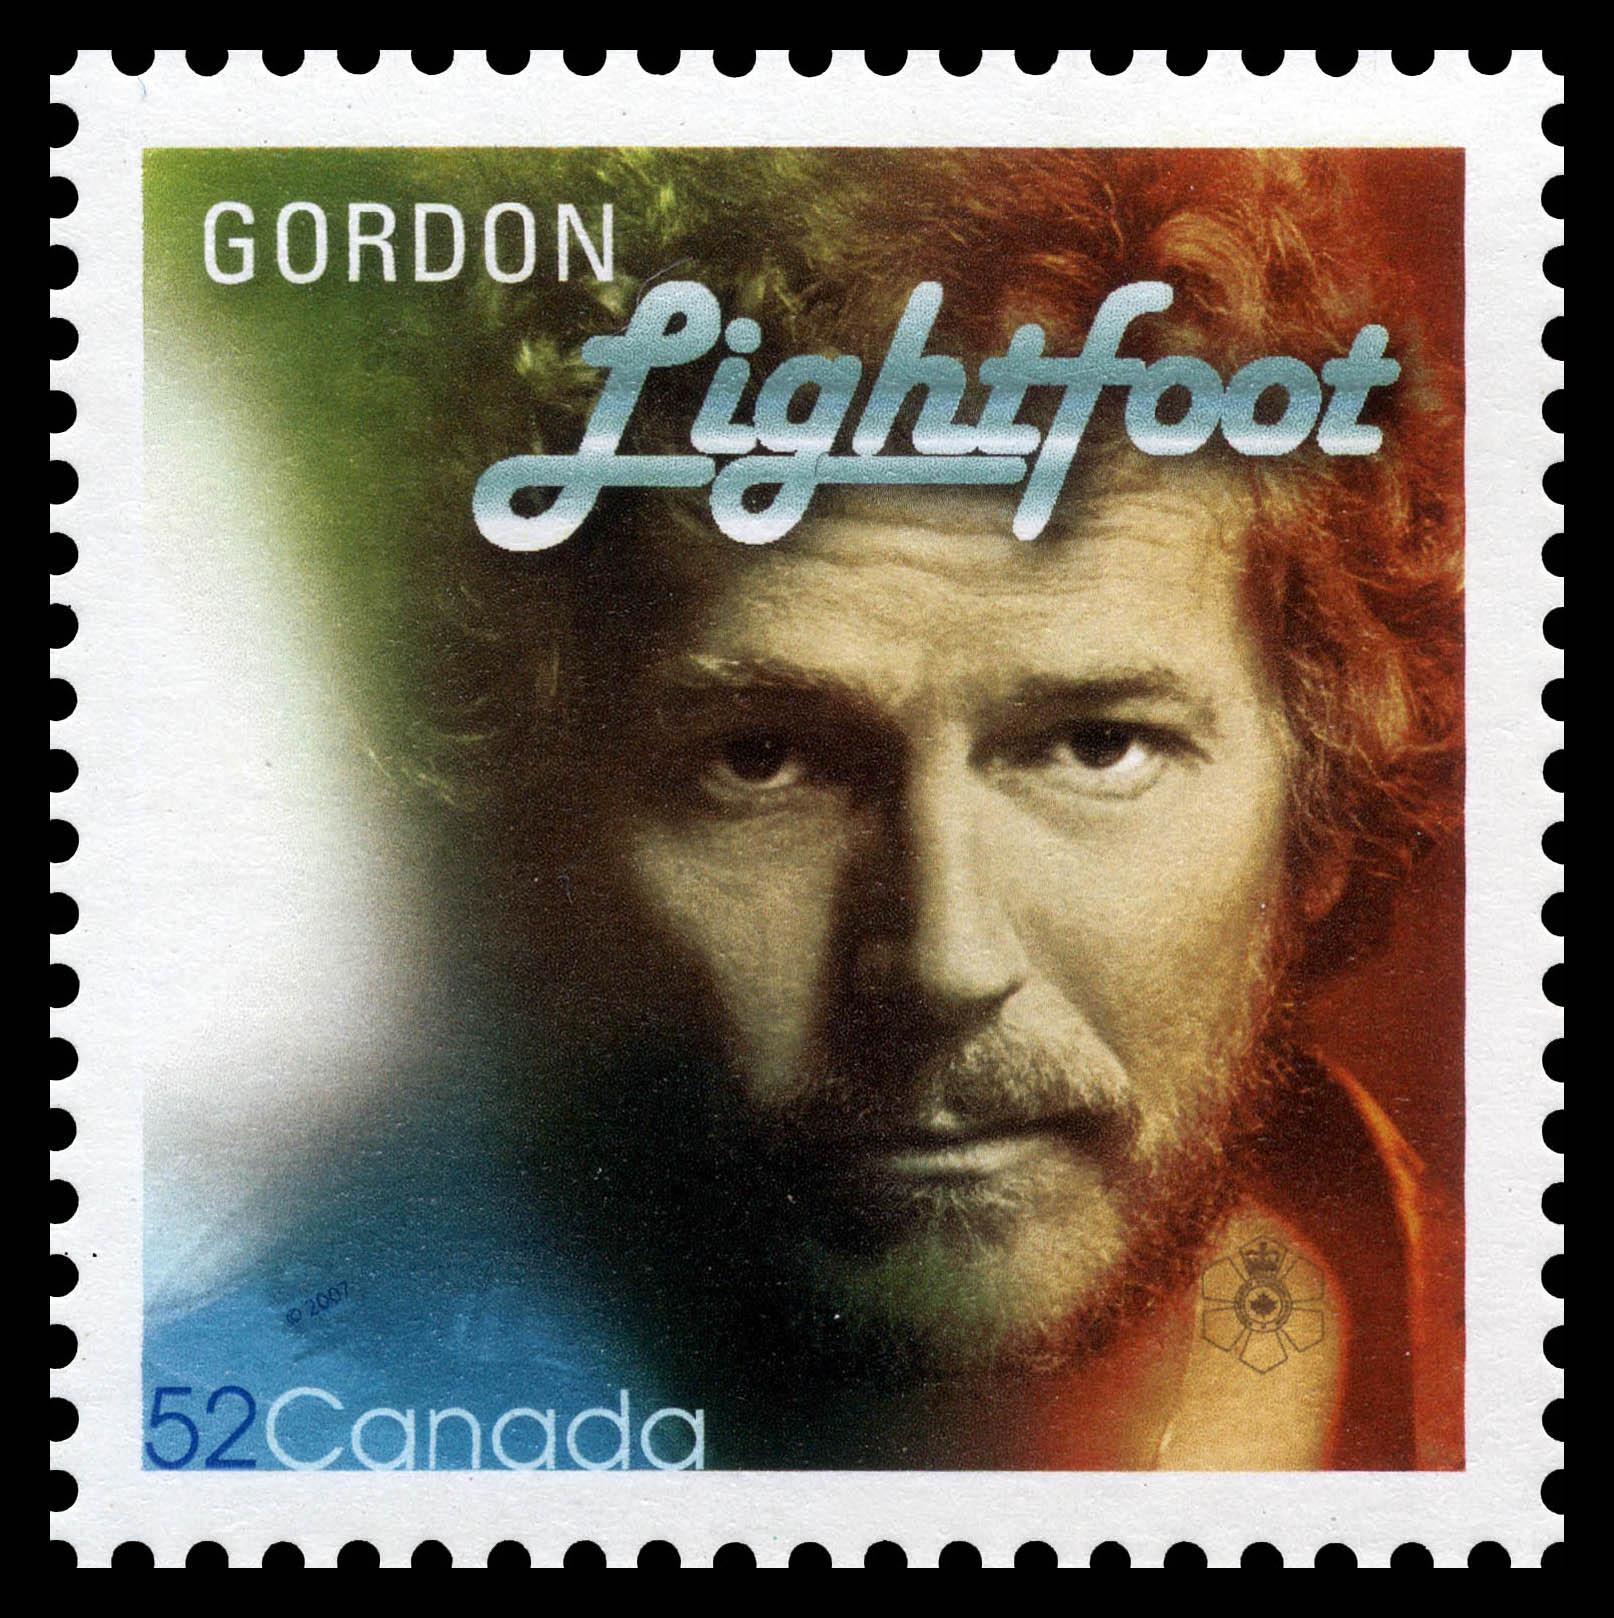 Gordon Lightfoot Canada Postage Stamp